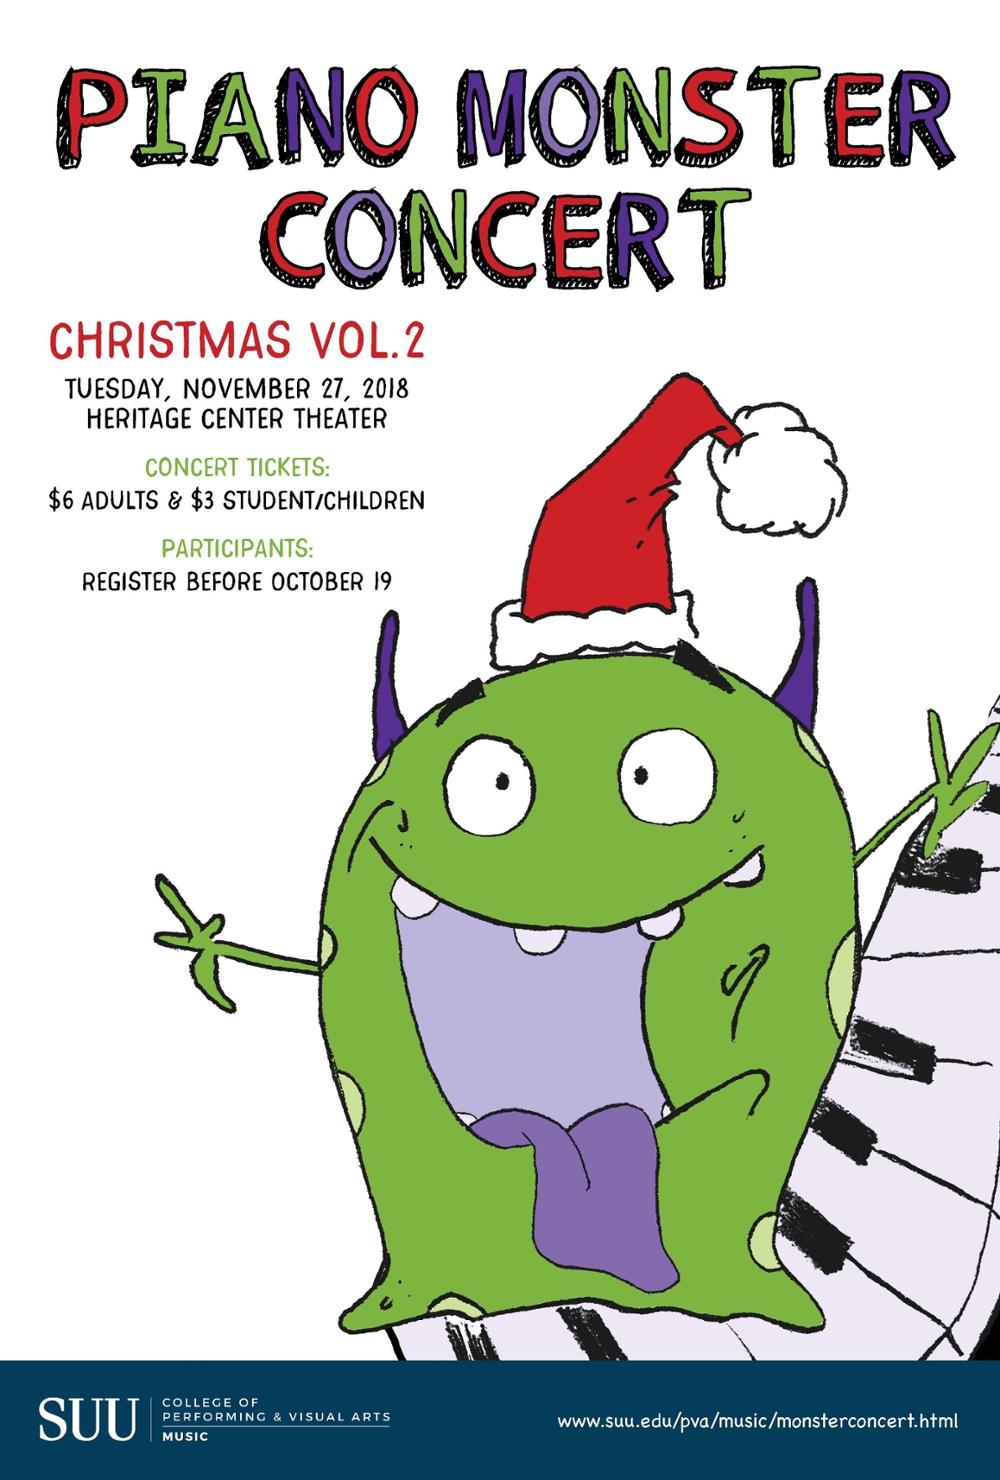 SUU's Piano Concert event flyer